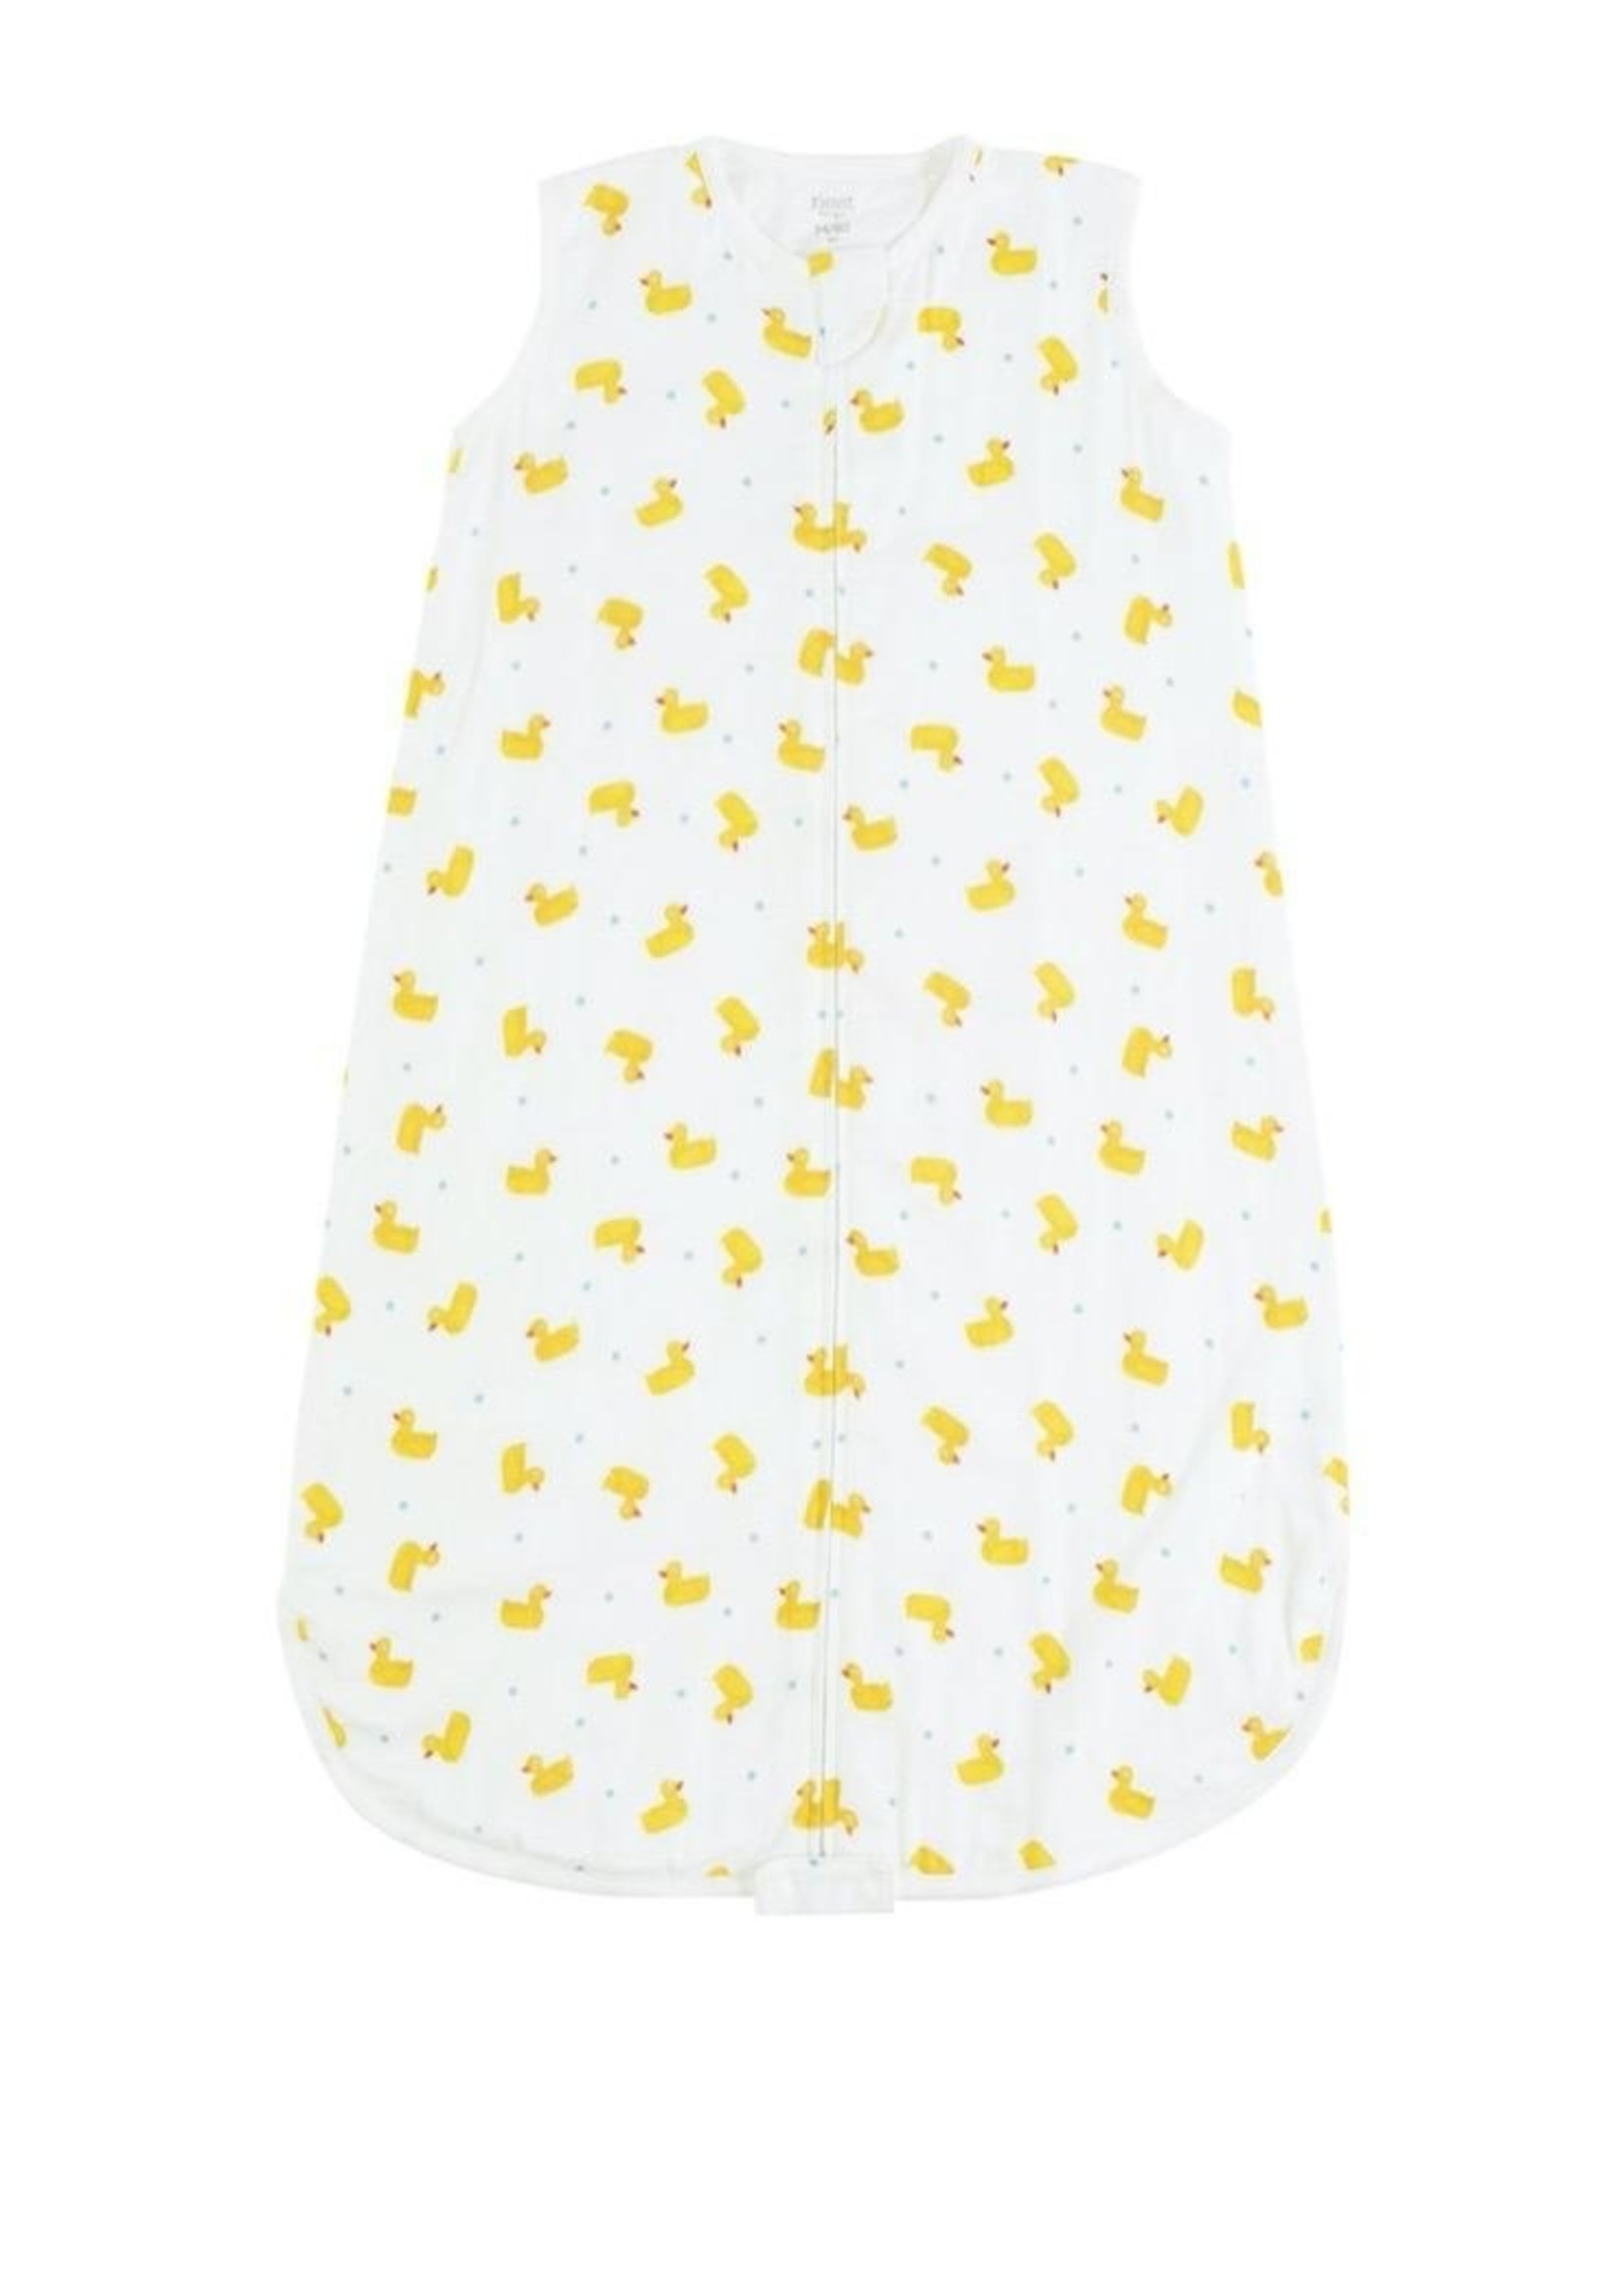 Nest Designs Eric Carle Bamboo Sleeveless Sleep Bag 0.6 TOG,  Little Rubber Ducks